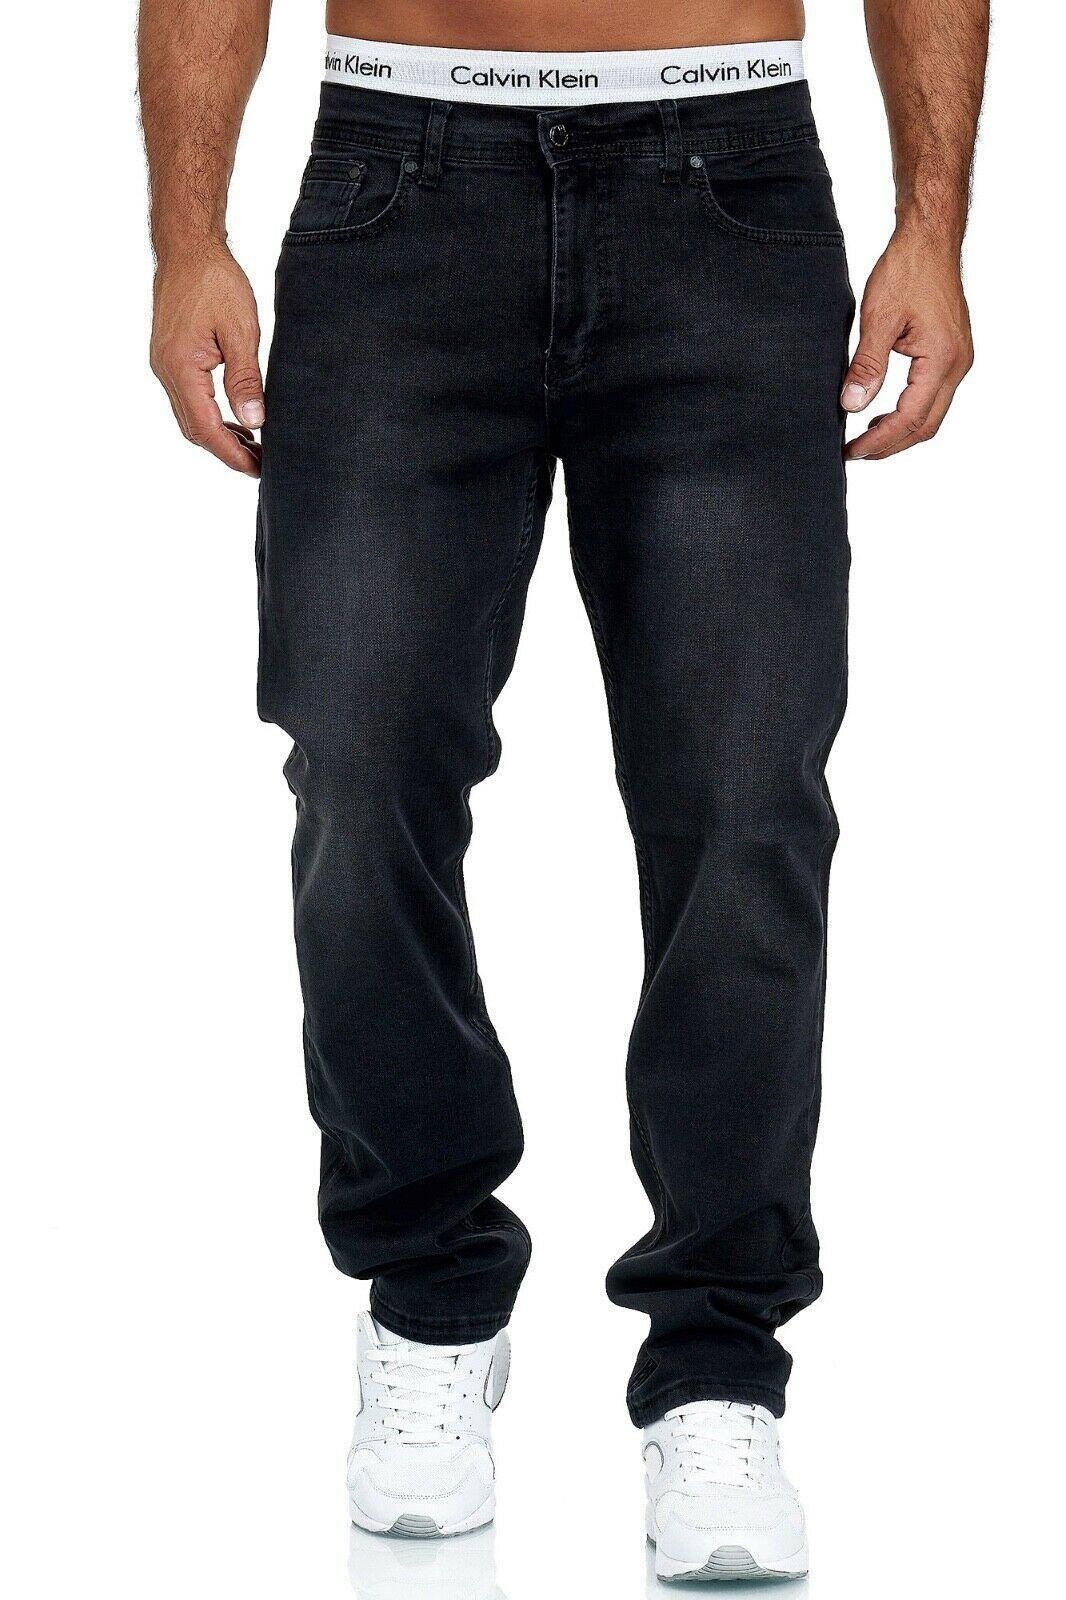 Herren-Jeans-Hose-Denim-KC-Black-Washed-Straight-Cut-Regular-Dicke-Naht-naehte Indexbild 51